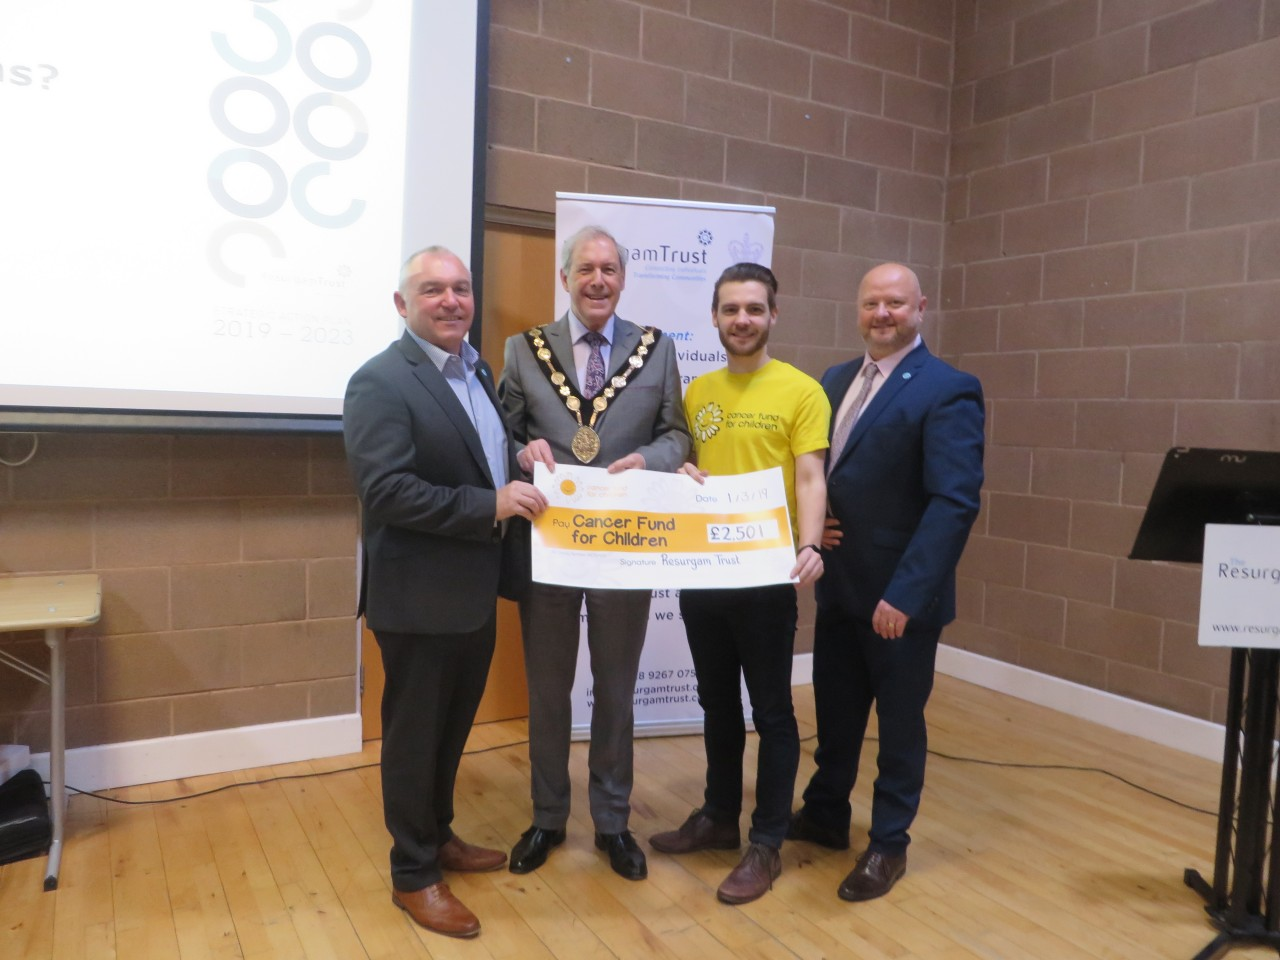 Resurgam raise £2501 for Cancer Fund for Children